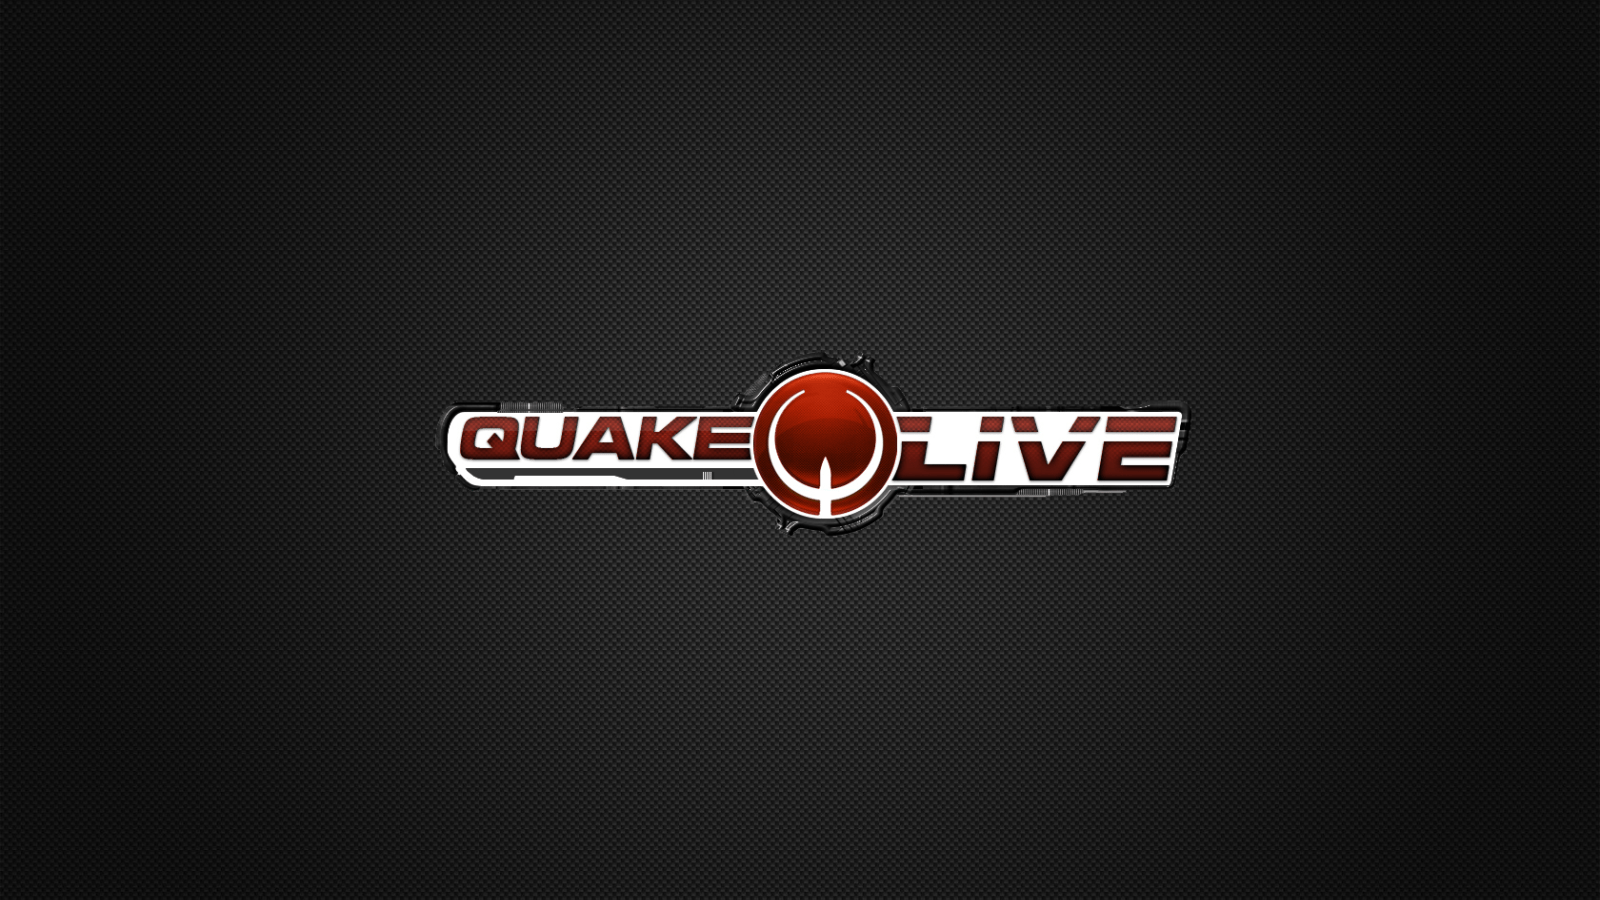 Video_Games_Quake_Live_55566